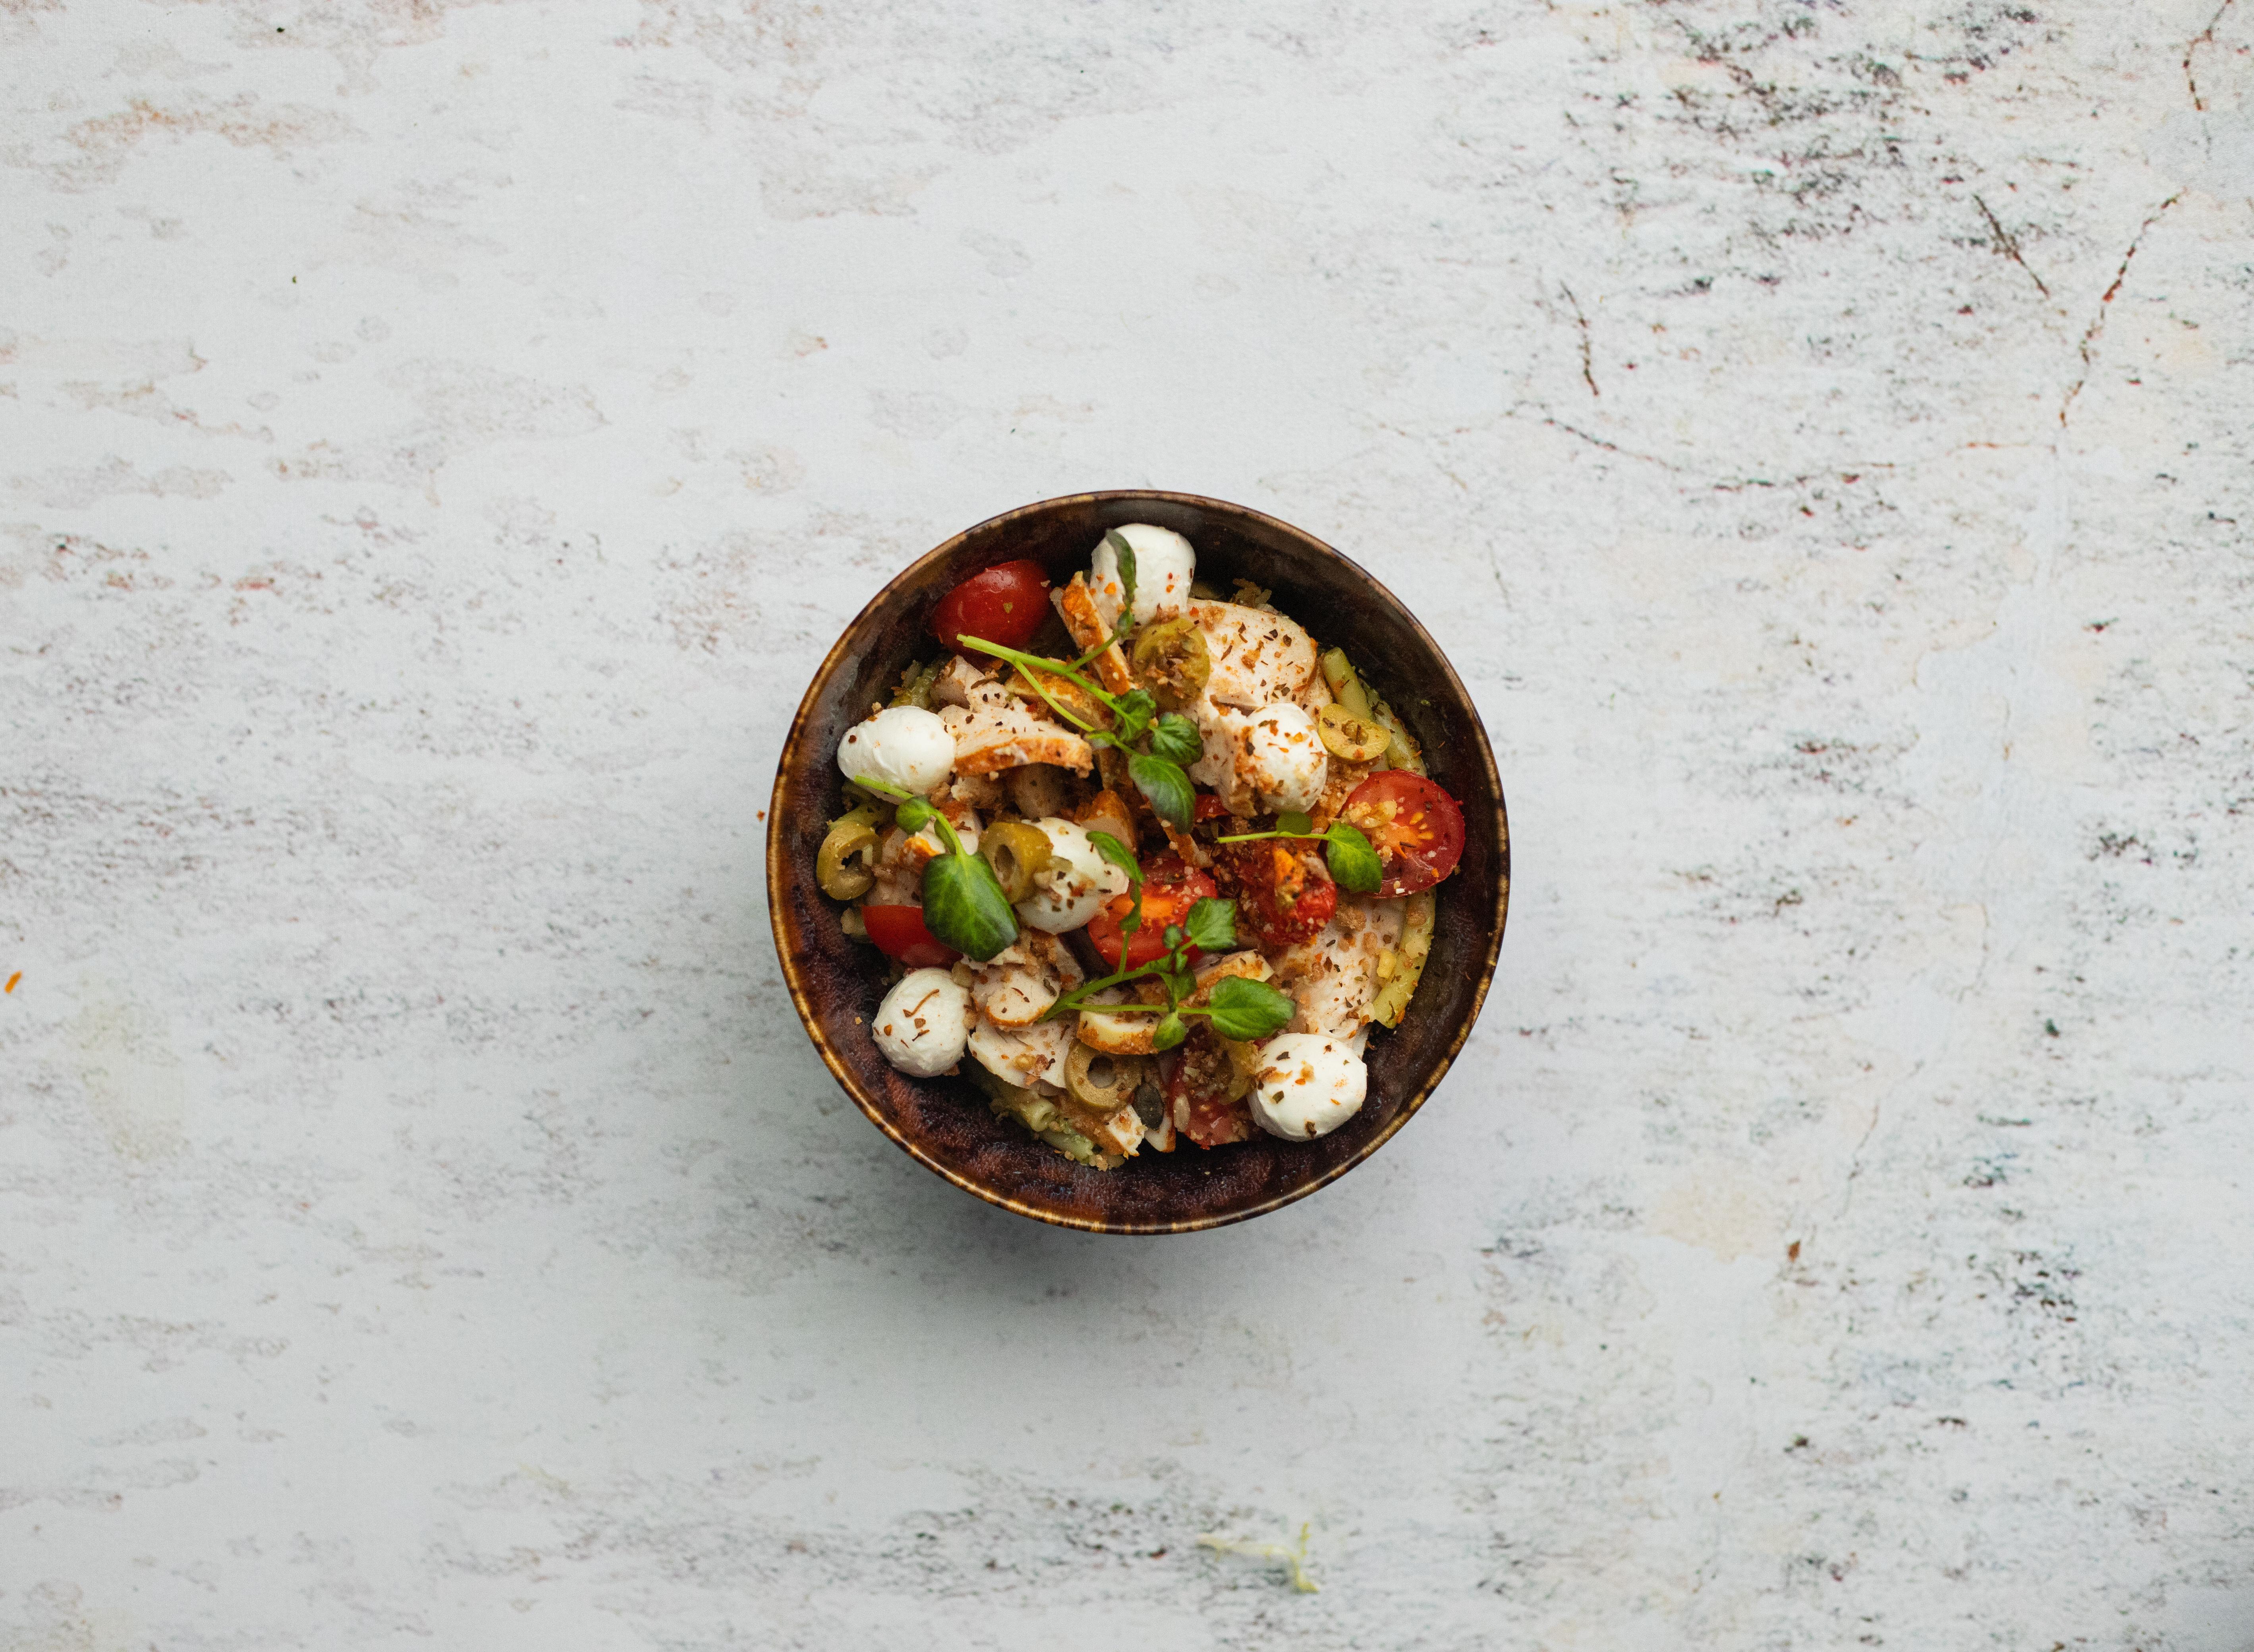 Salade pasta pesto met kip